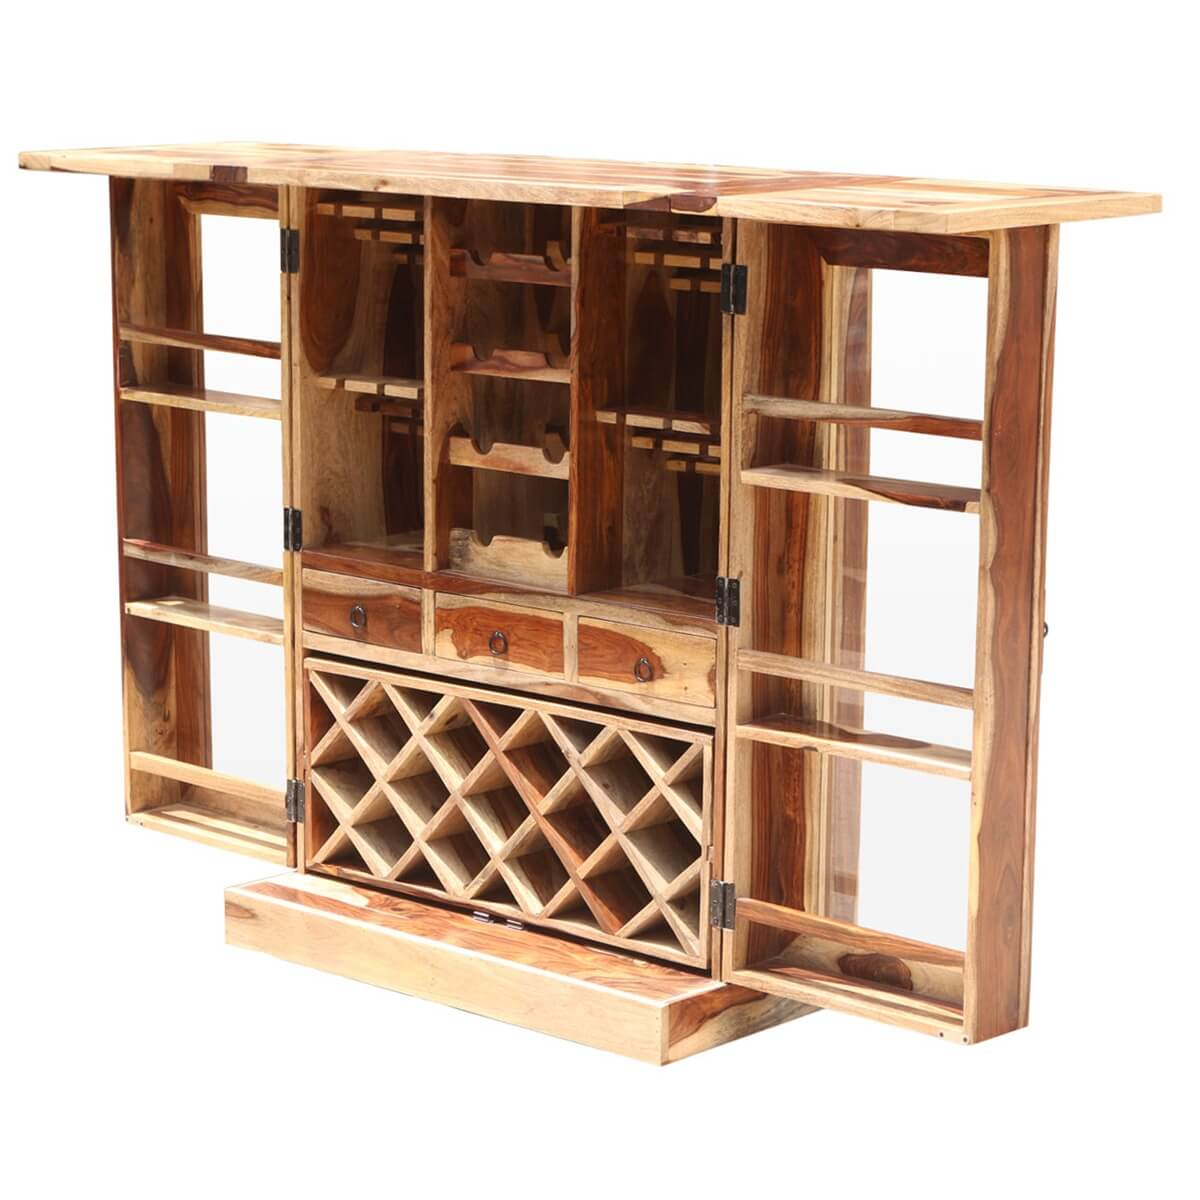 sc 1 st  Sierra Living Concepts & Cordaville Solid Wood Foldout Complete Wine Bar Liquor Cabinet